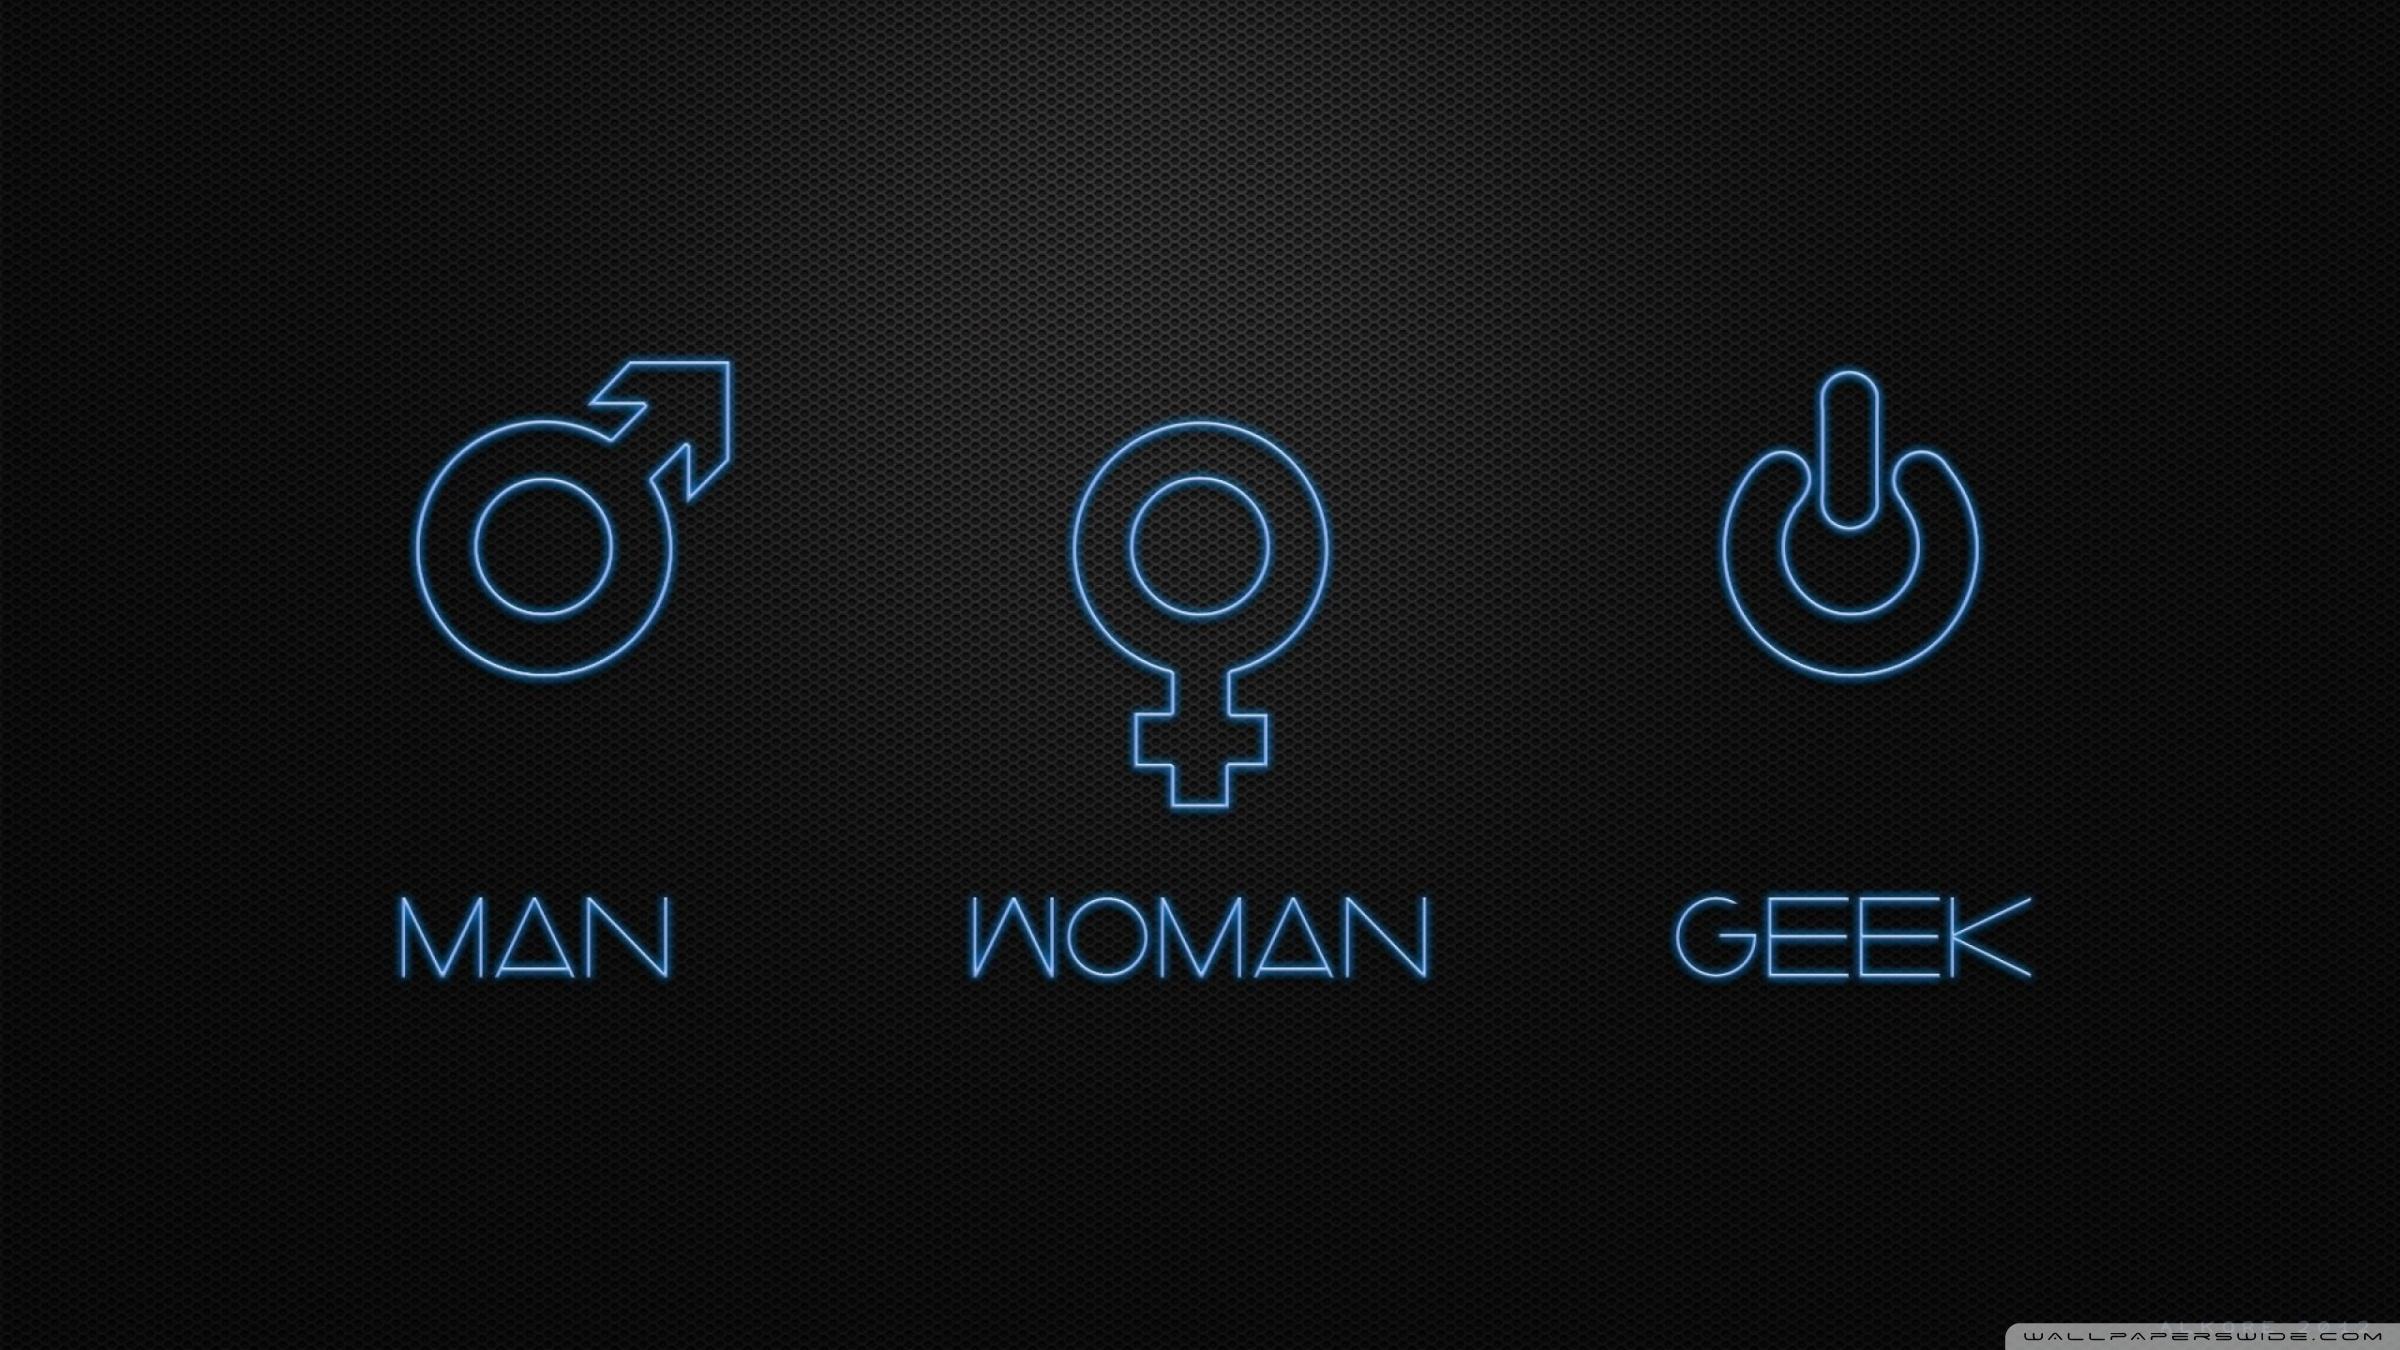 Lord Wallpaper Hd Download Man Woman Geek Wallpaper 2400x1350 25167